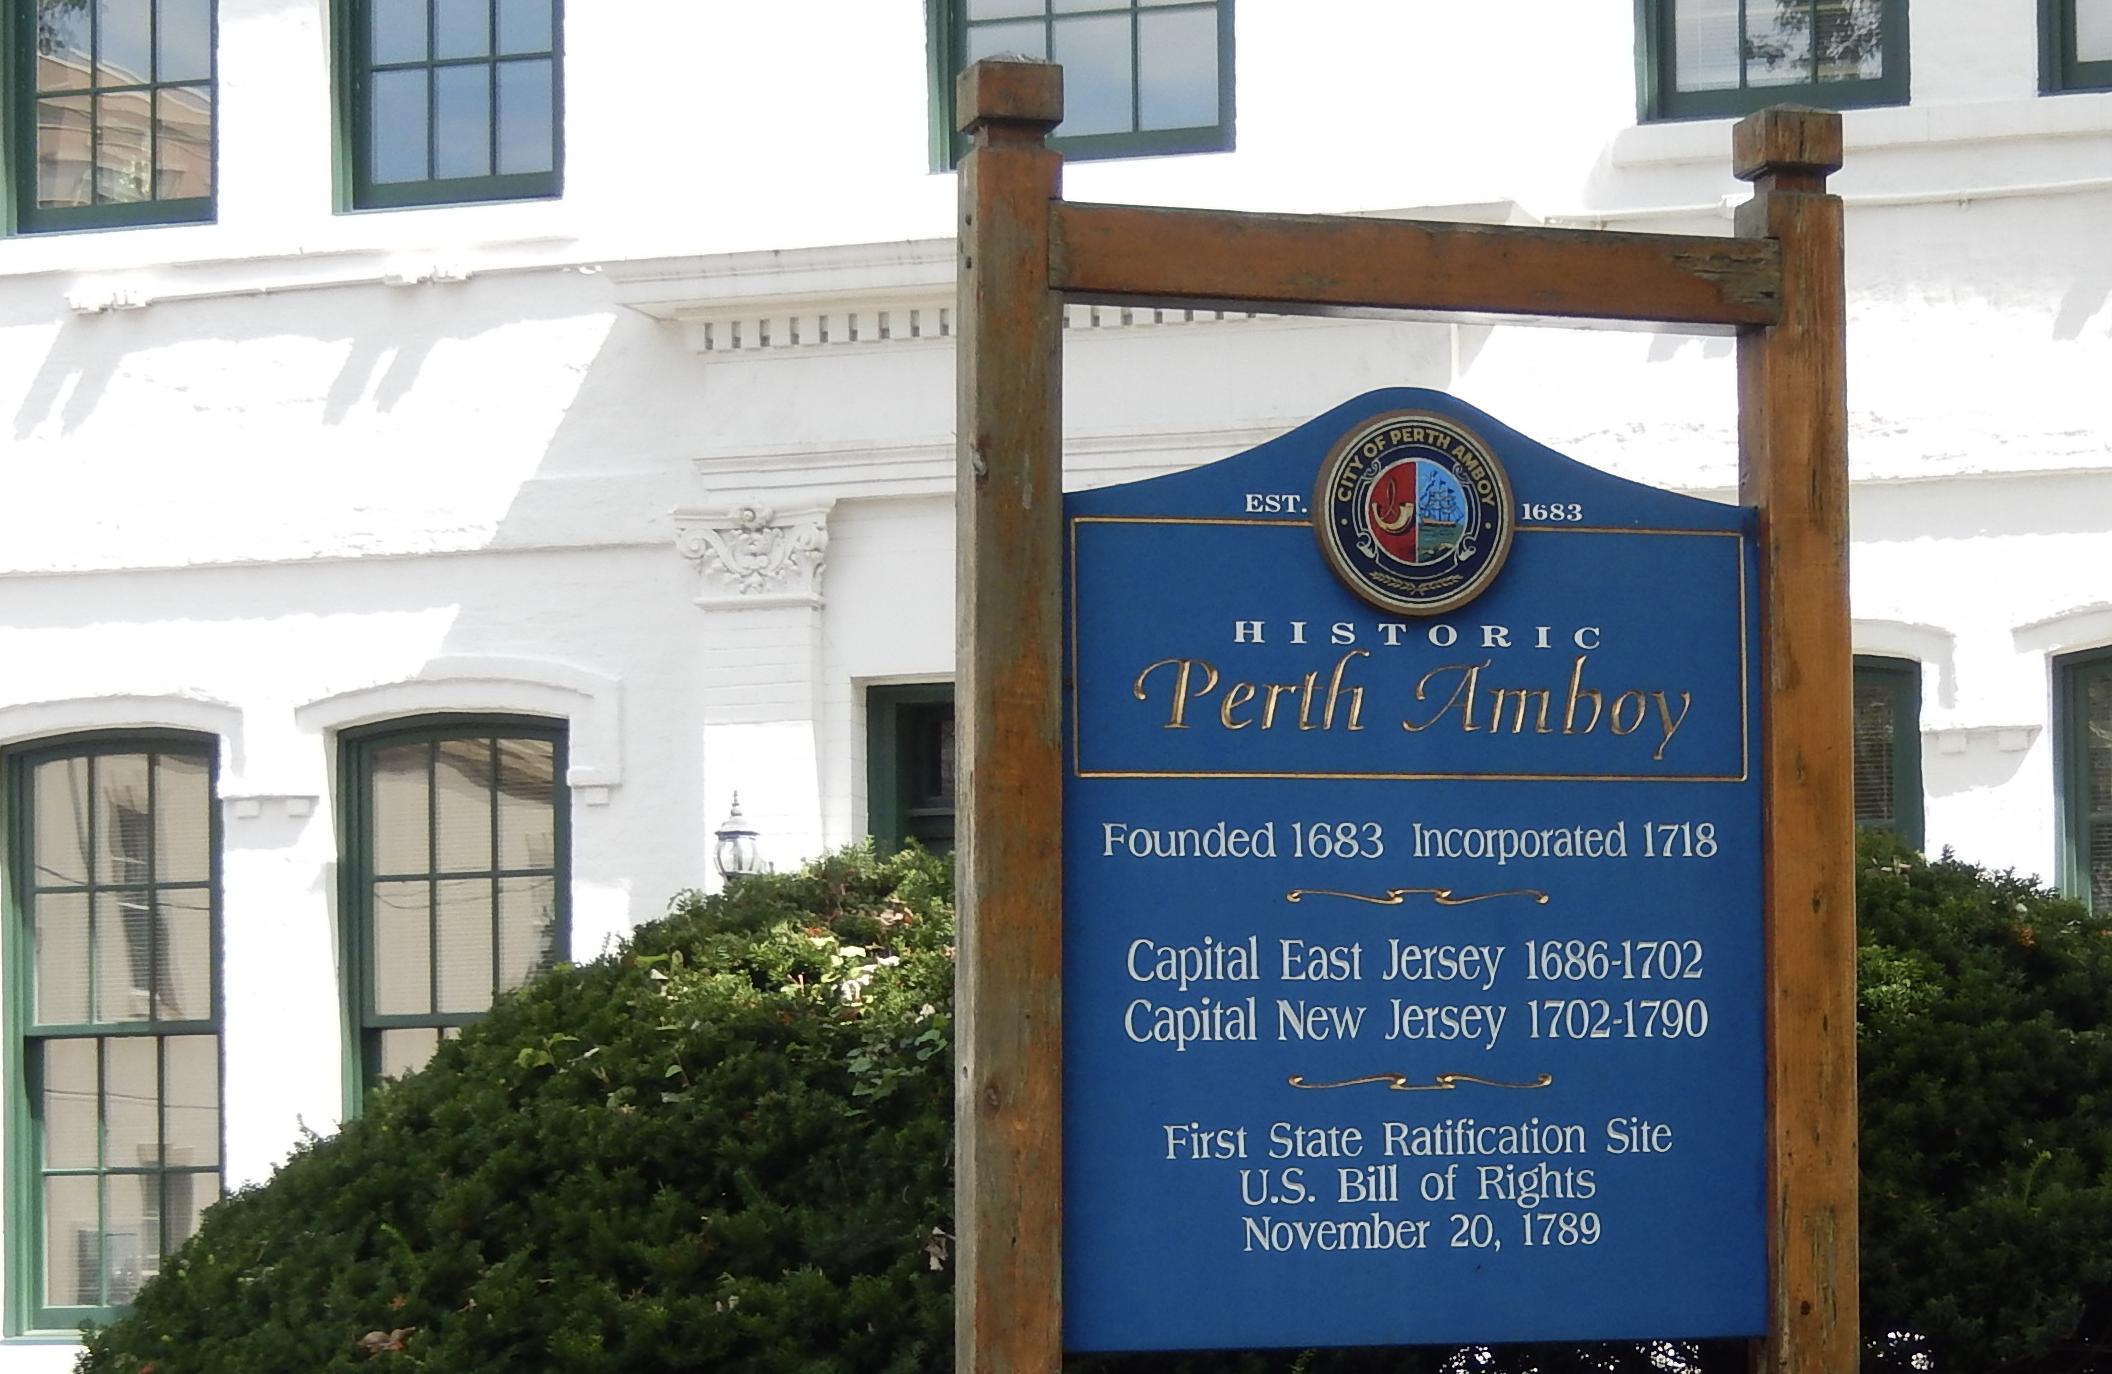 Historic Perth Amboy City Hall